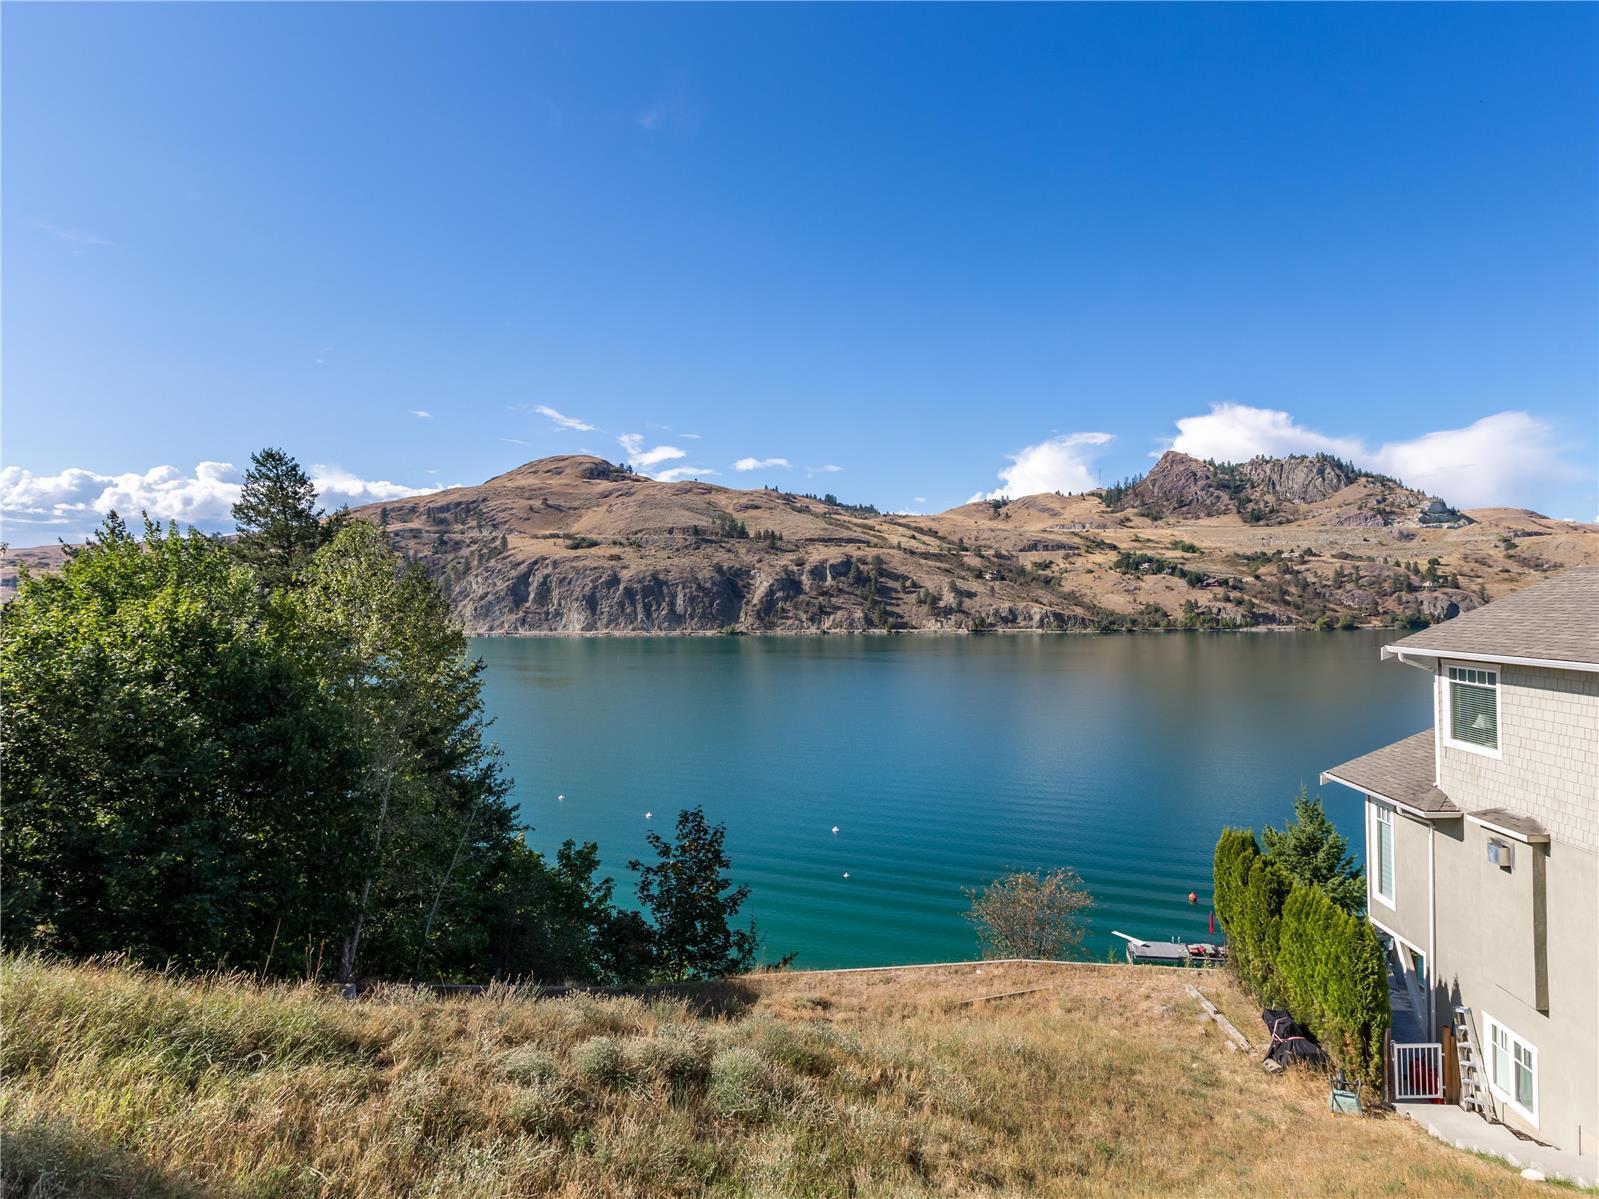 13940 Ponderosa Way,, Coldstream, British Columbia  V1B 1A4 - Photo 2 - 10216769